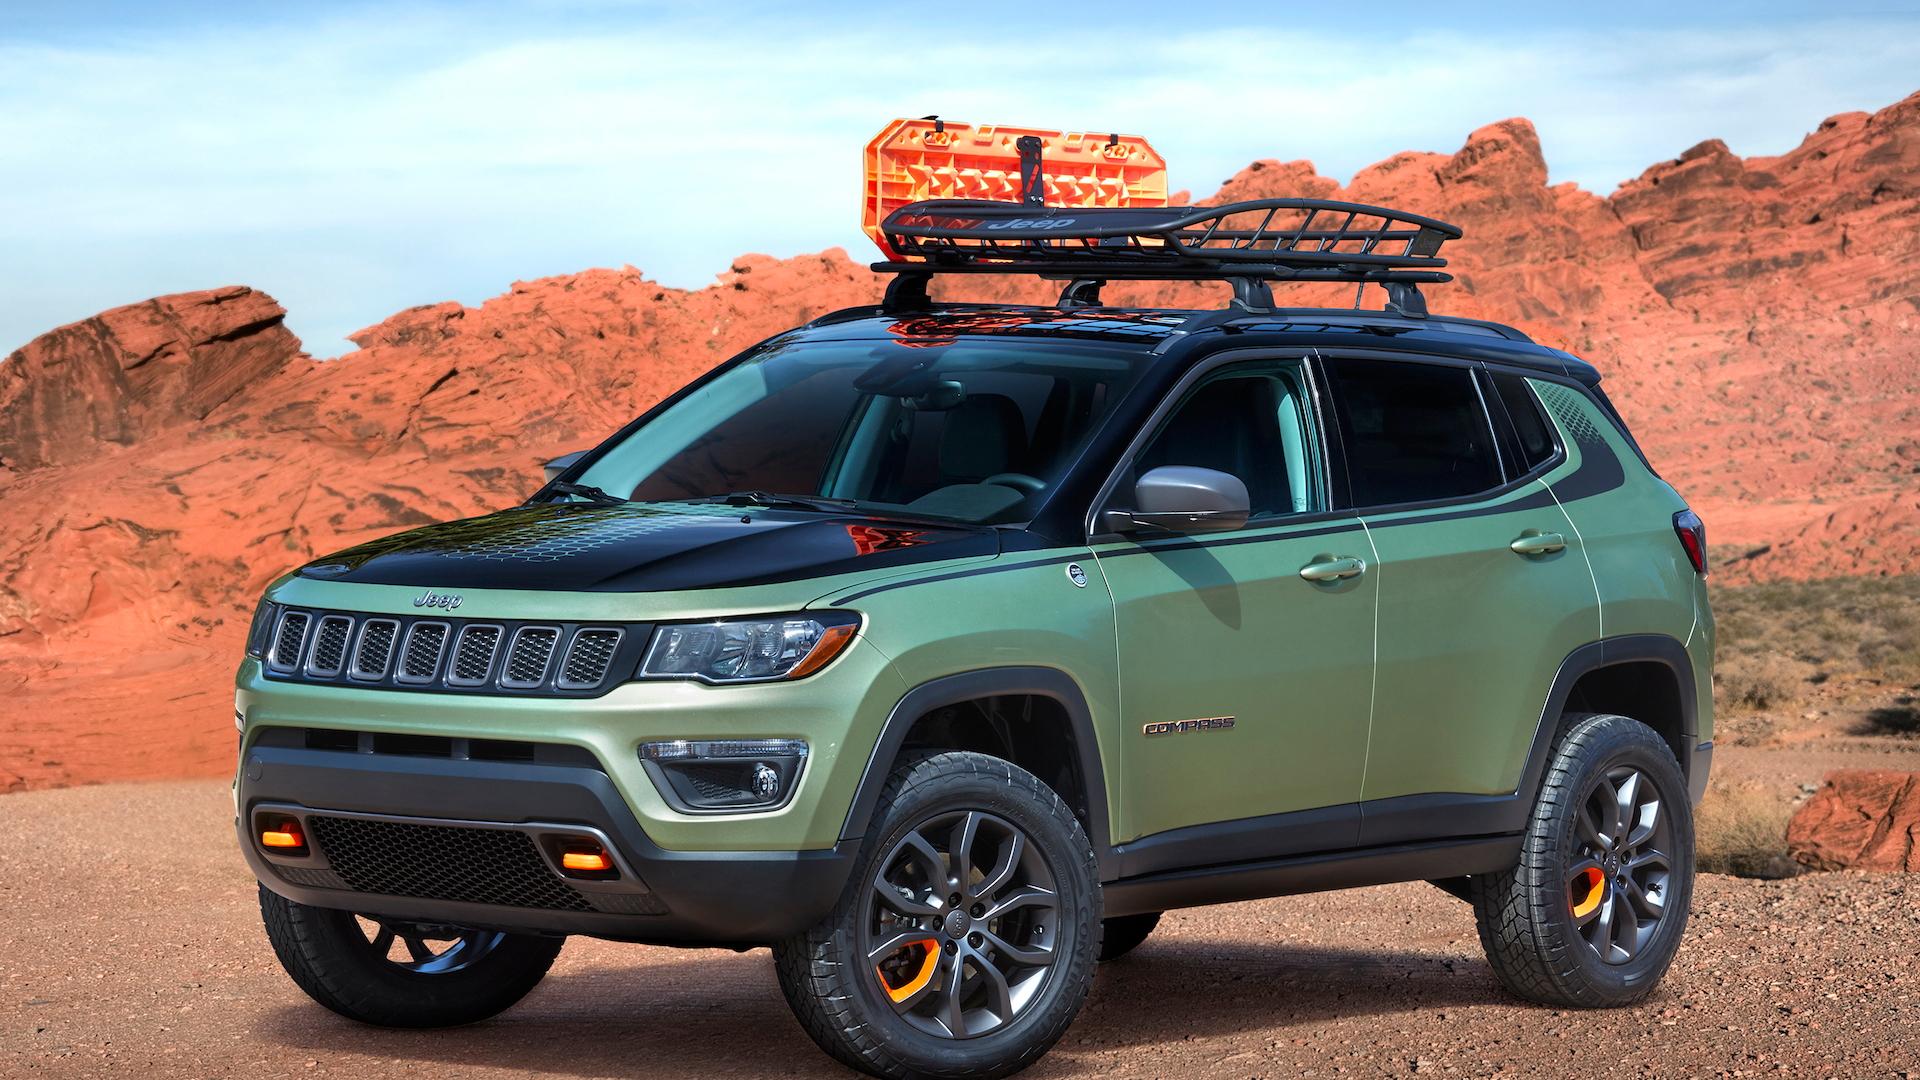 Jeep Trailpass for Moab Easter Jeep Safari, 2017